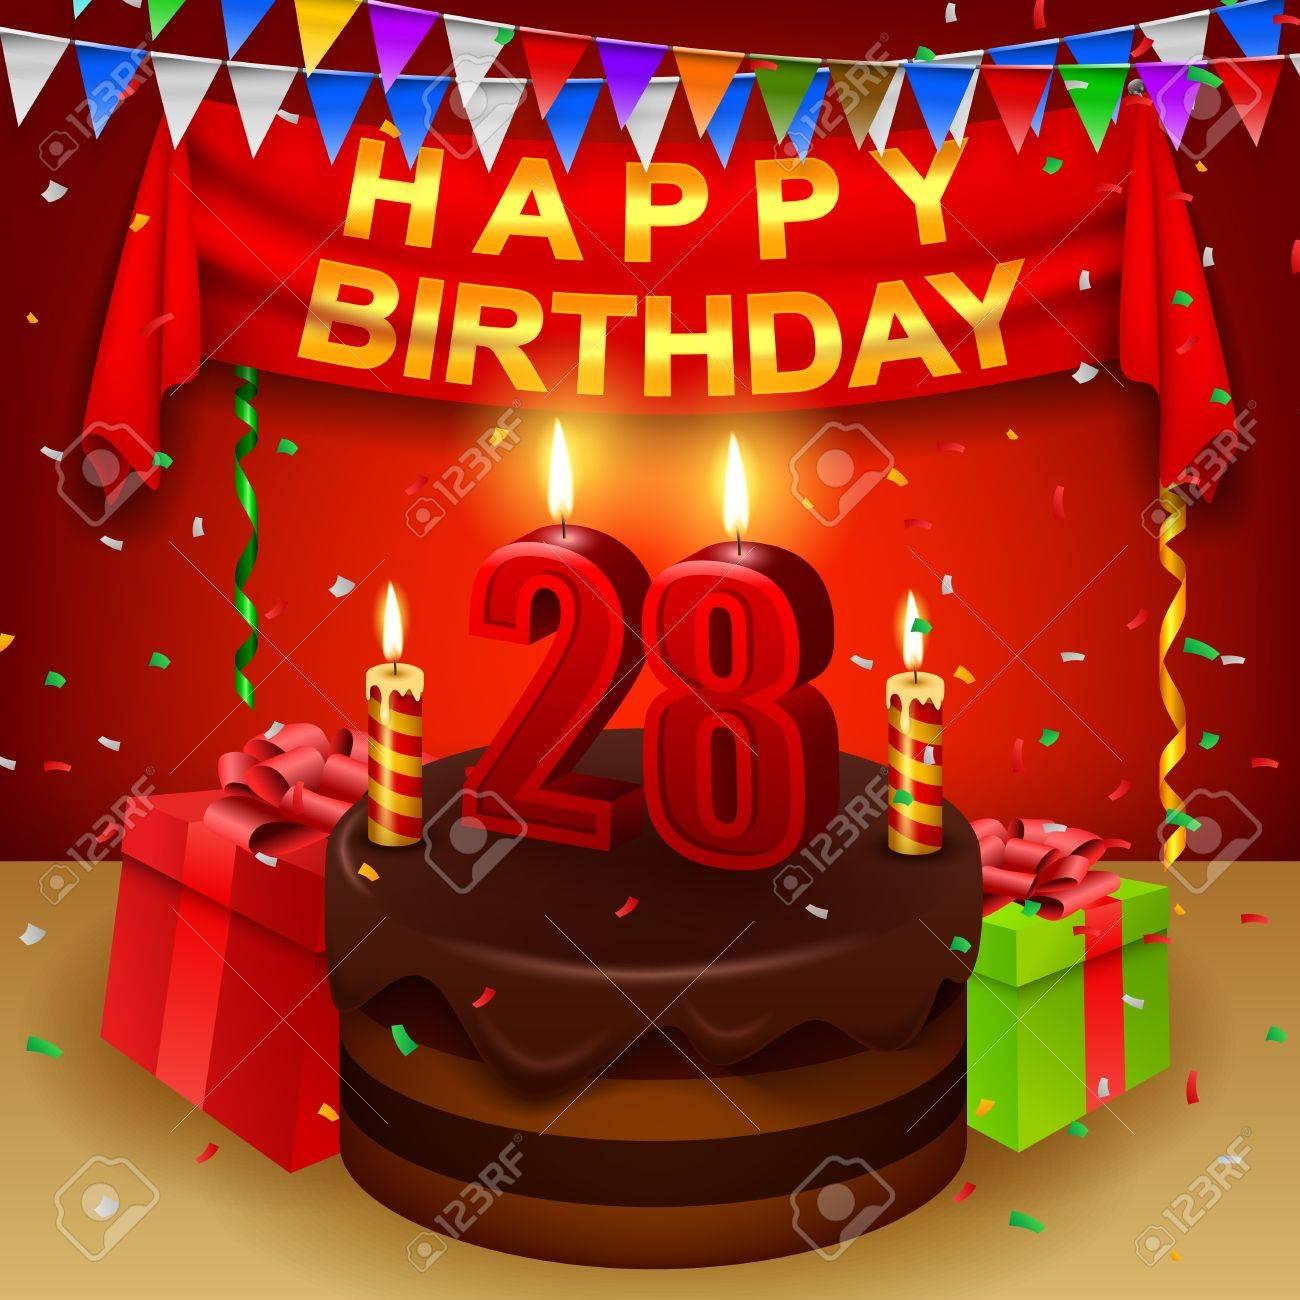 Happy 28th Birthday With Chocolate Cream Cake And Triangular Flag Stock Vector